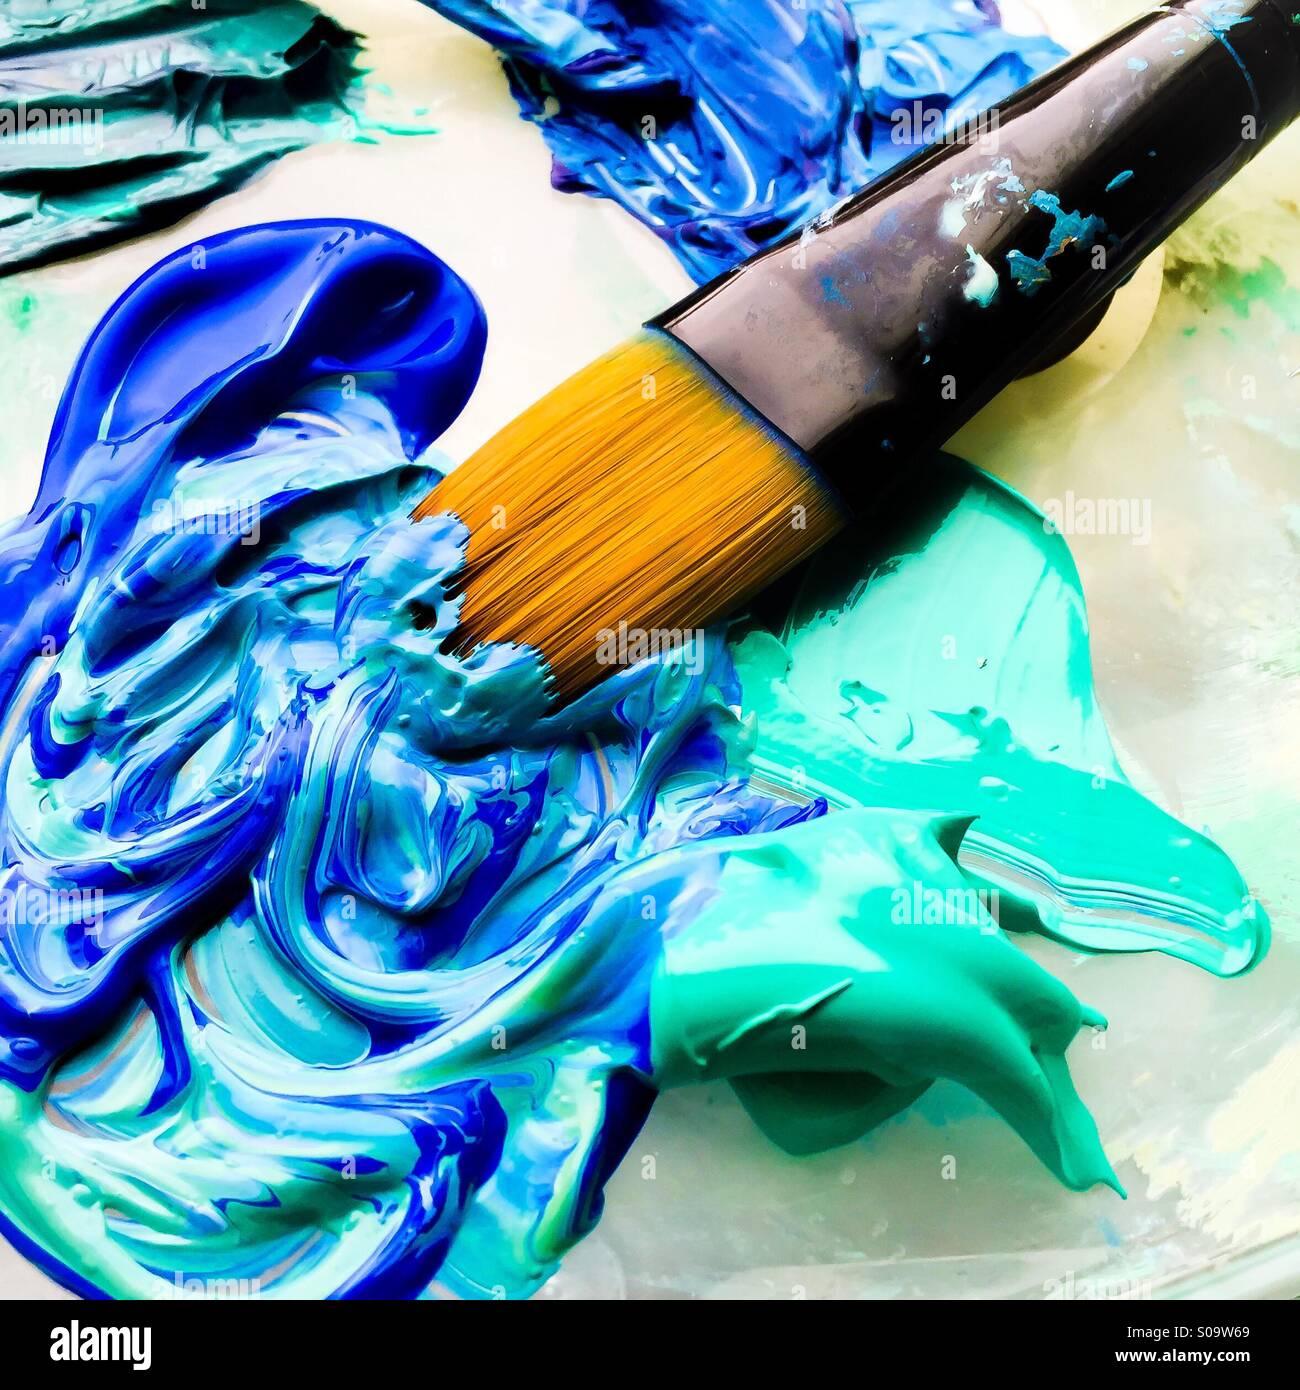 Pincel y pintura en azul turquesa foto imagen de stock - Pintura azul turquesa ...